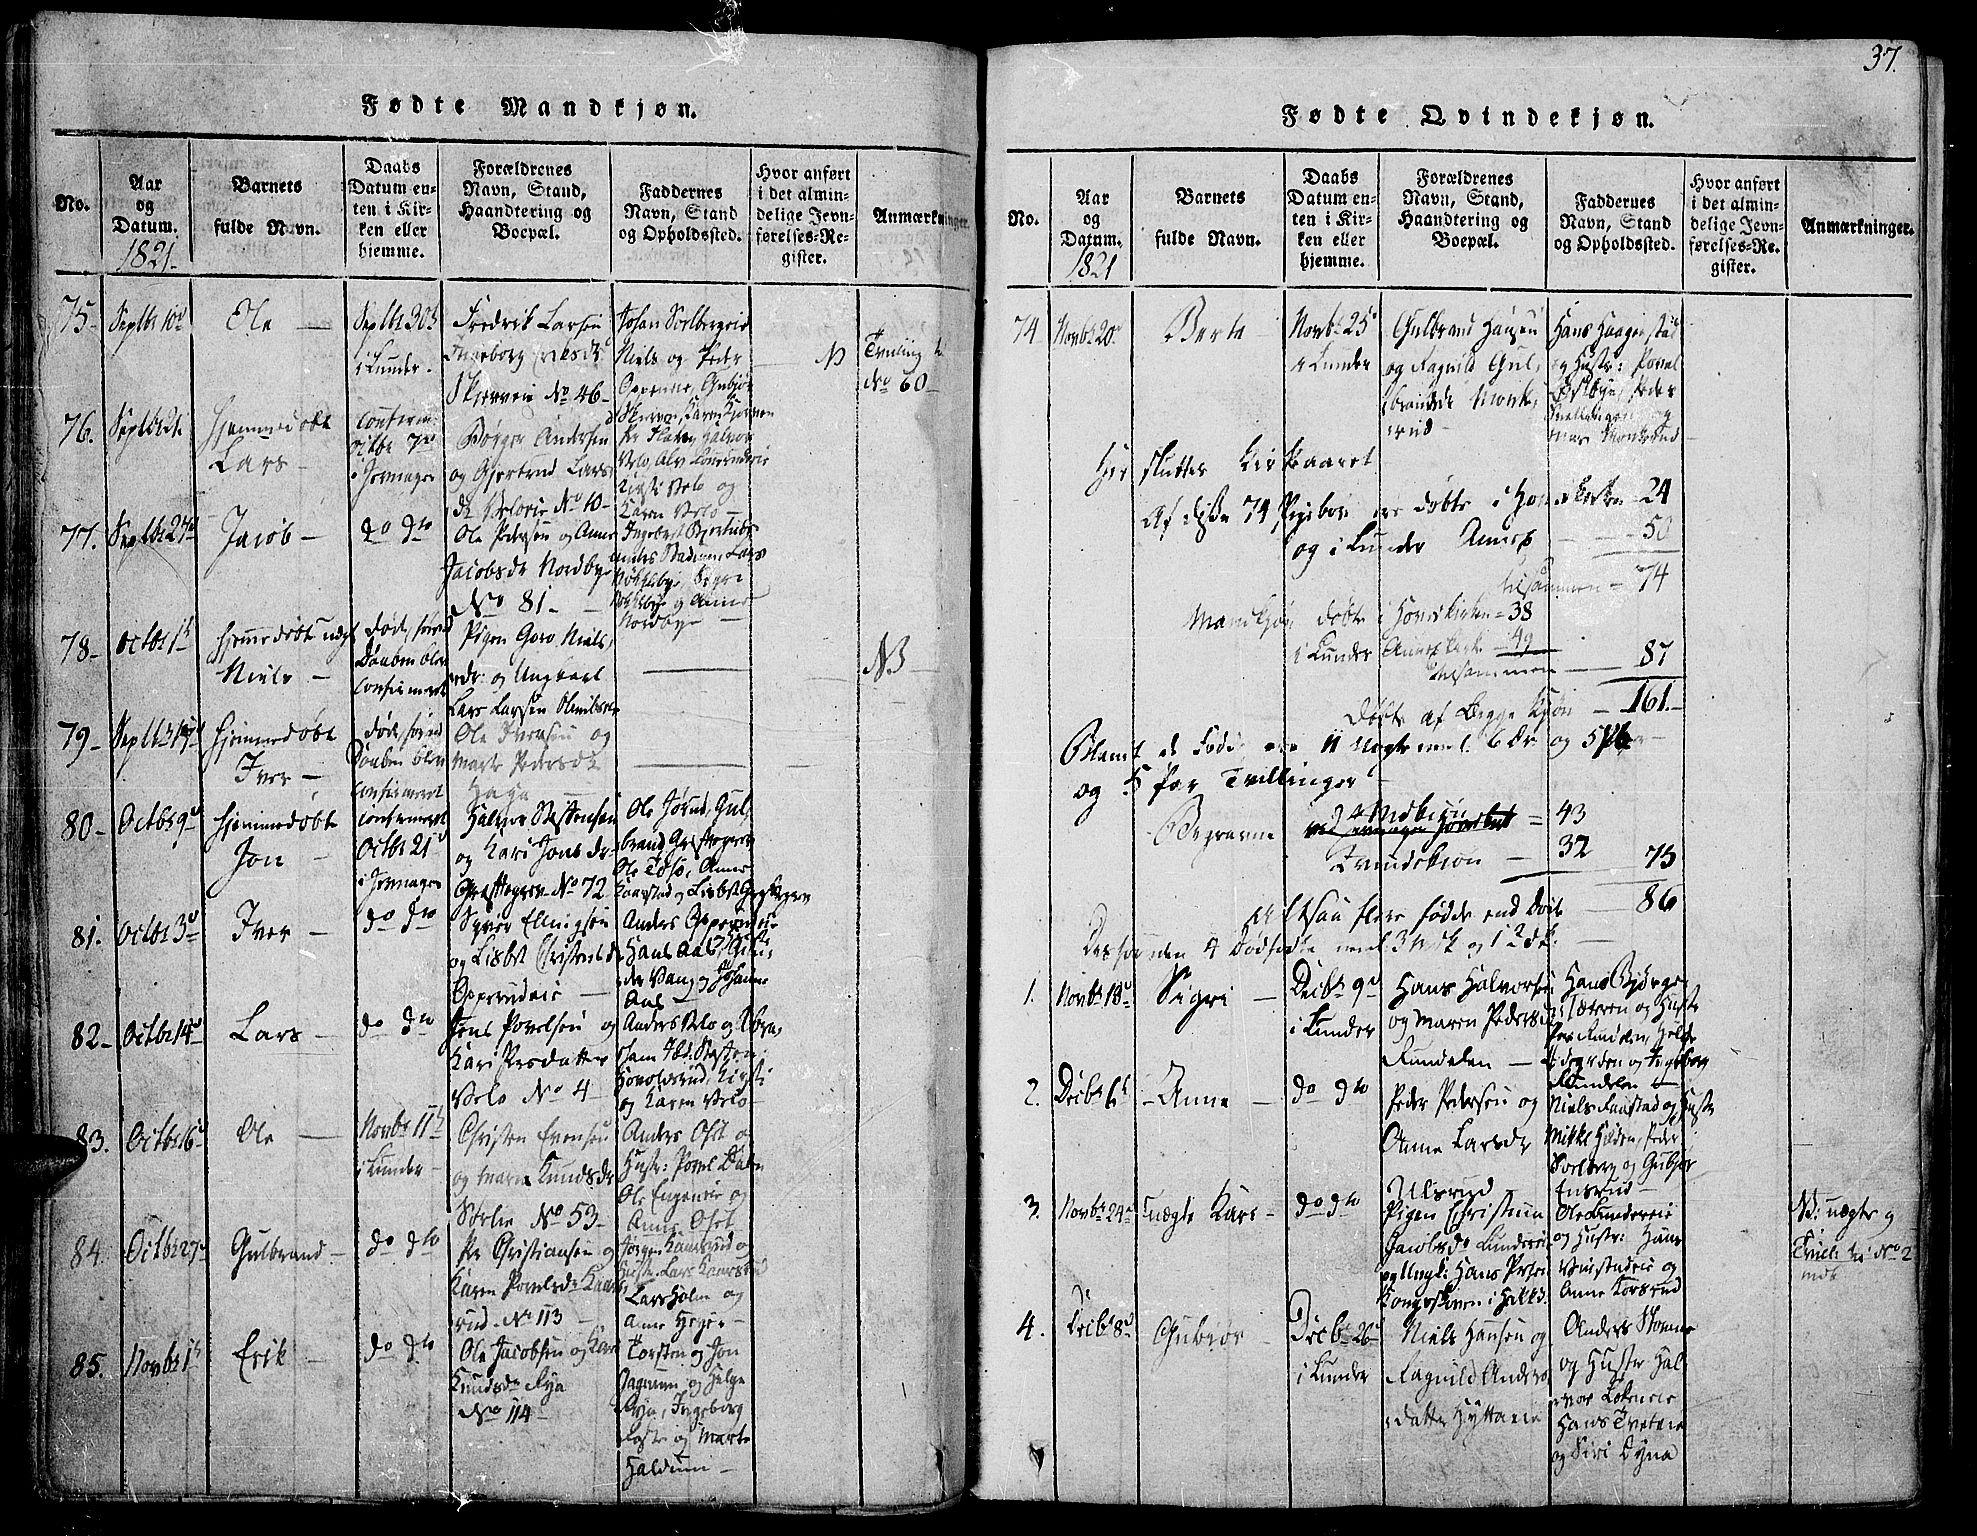 SAH, Jevnaker prestekontor, Ministerialbok nr. 5, 1815-1837, s. 37